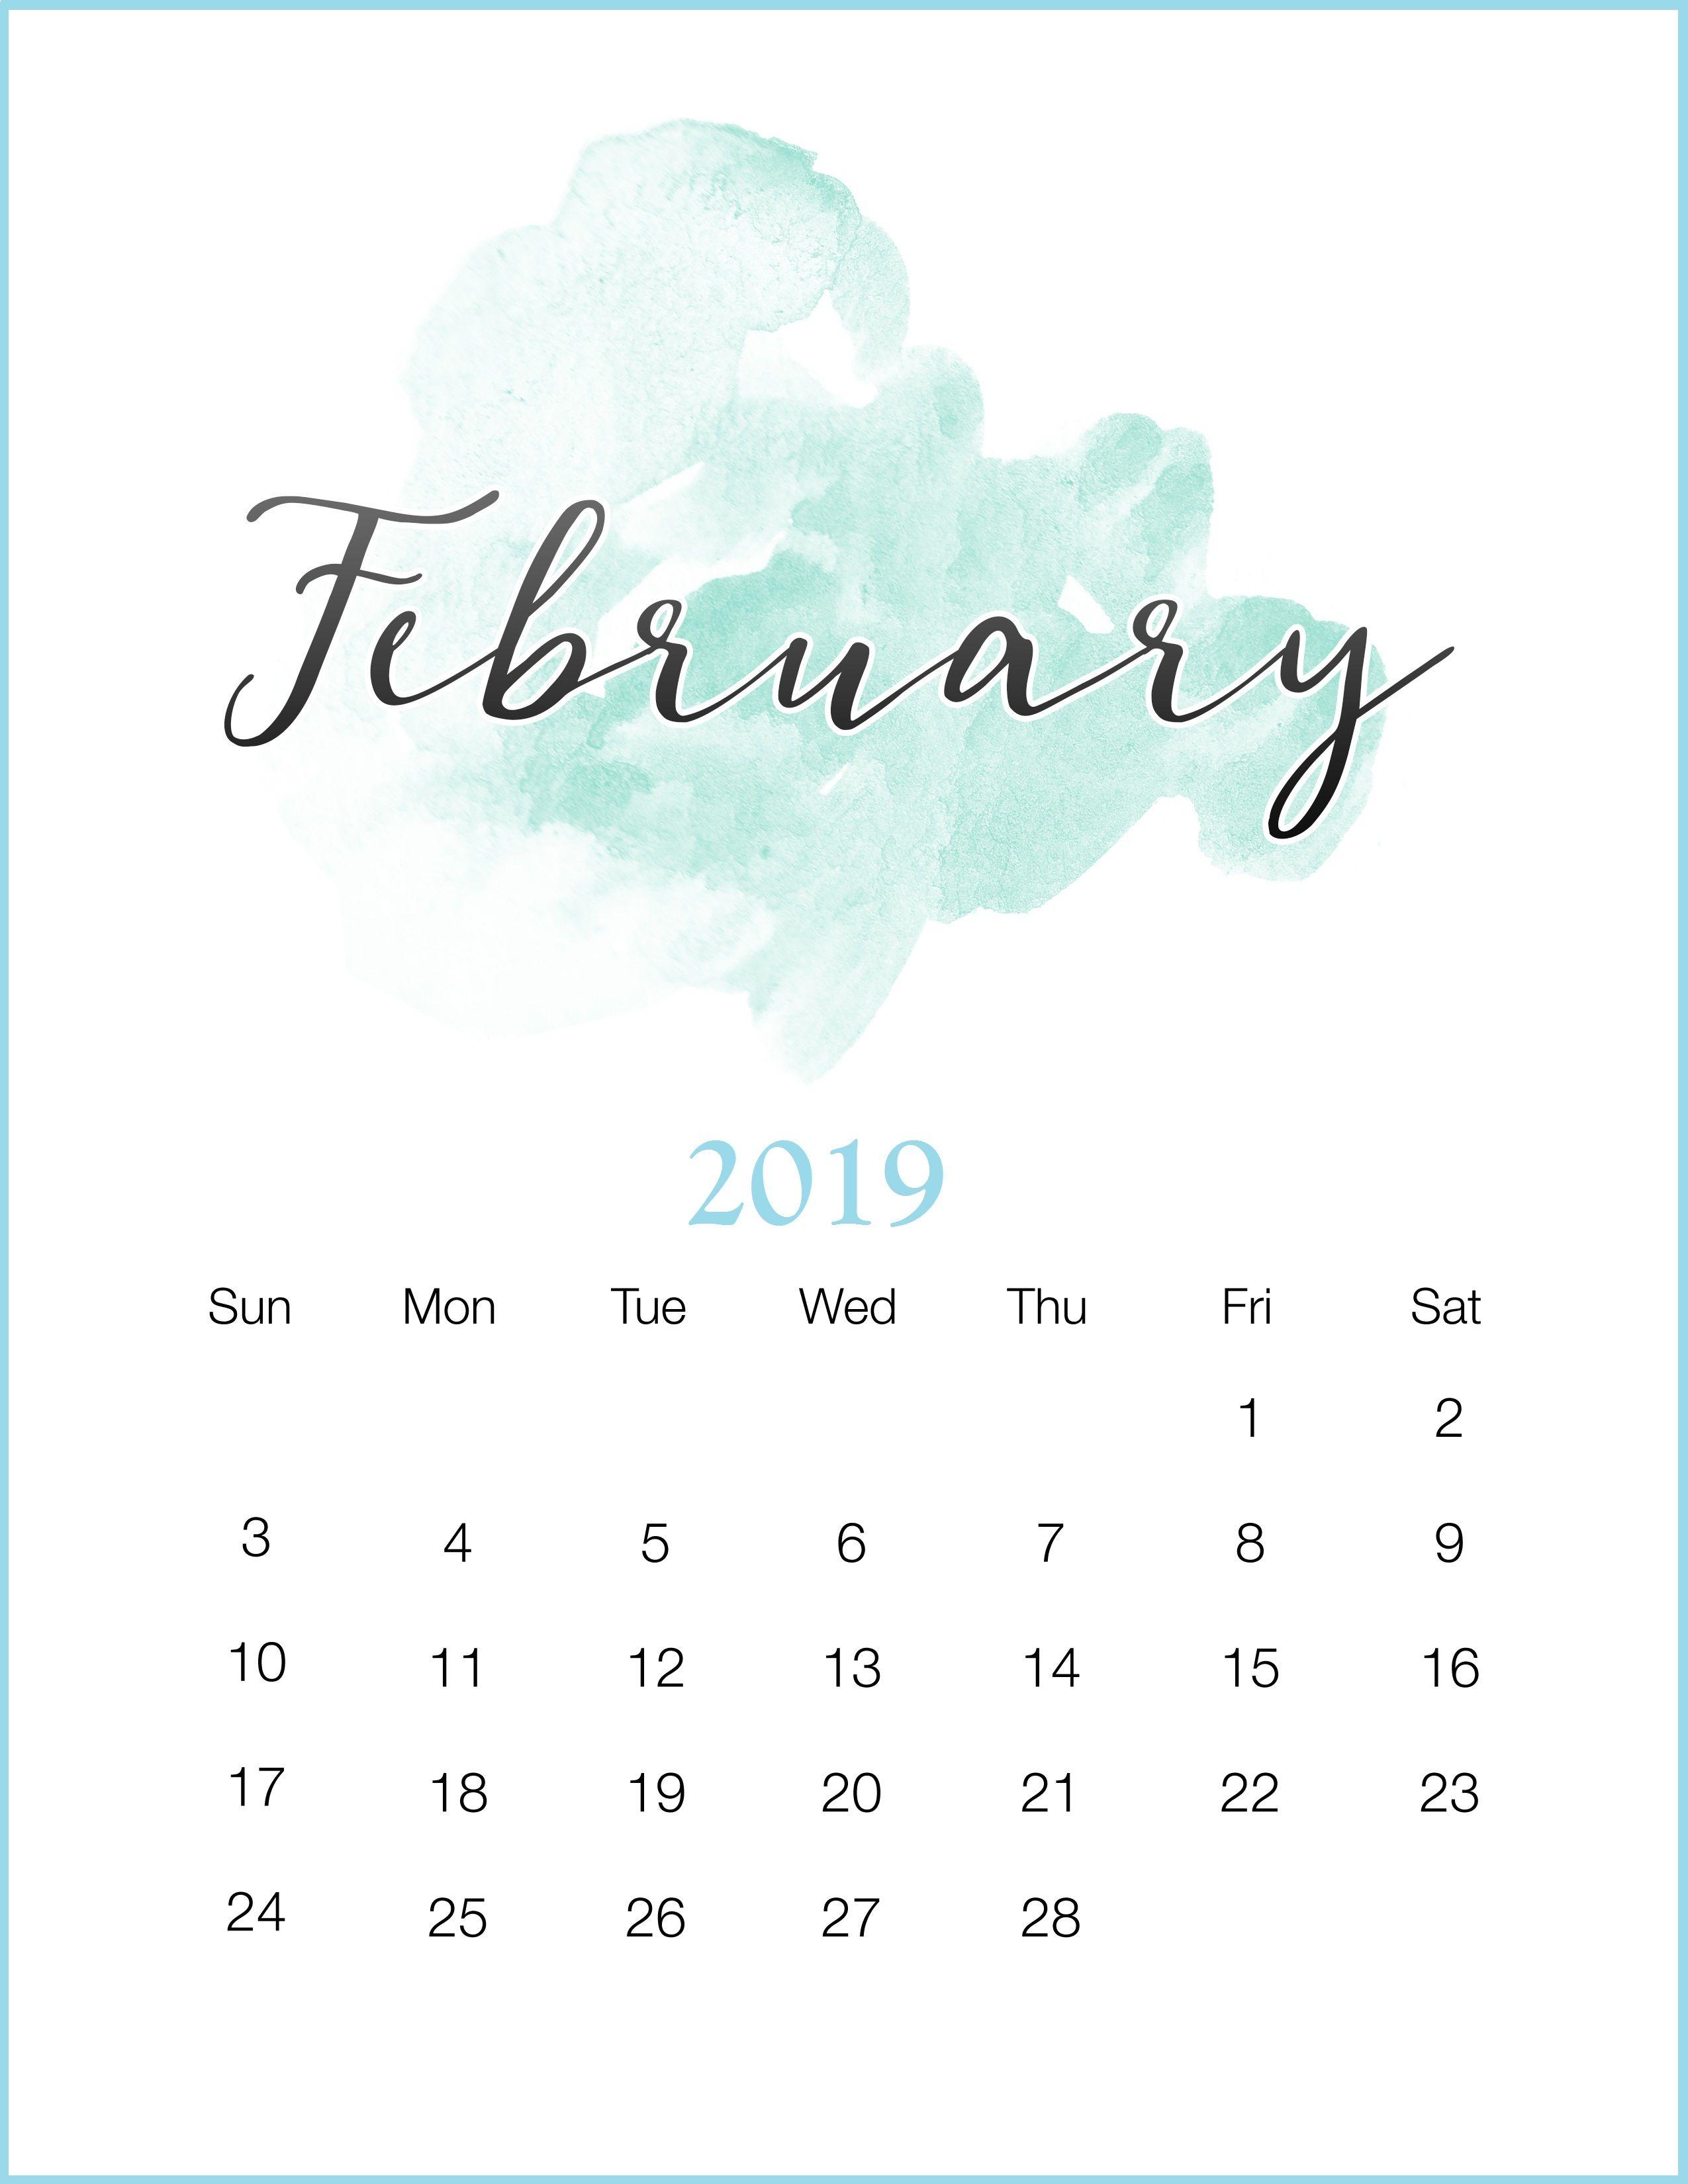 Watercolor February Printable Calendar February Watercolor